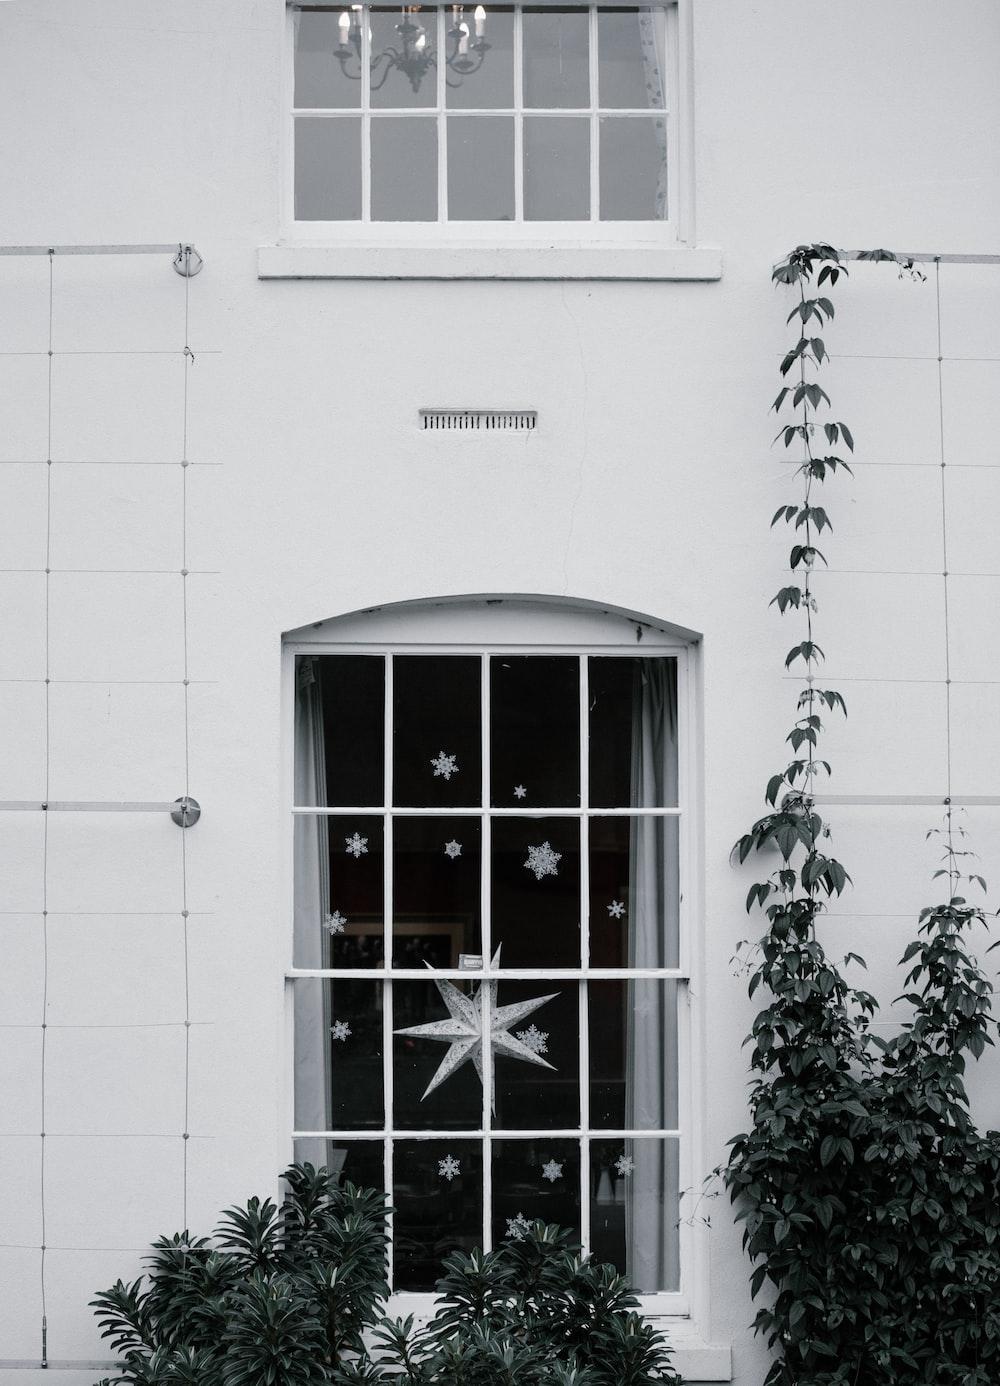 photo of white windowpane beside green leafed trees